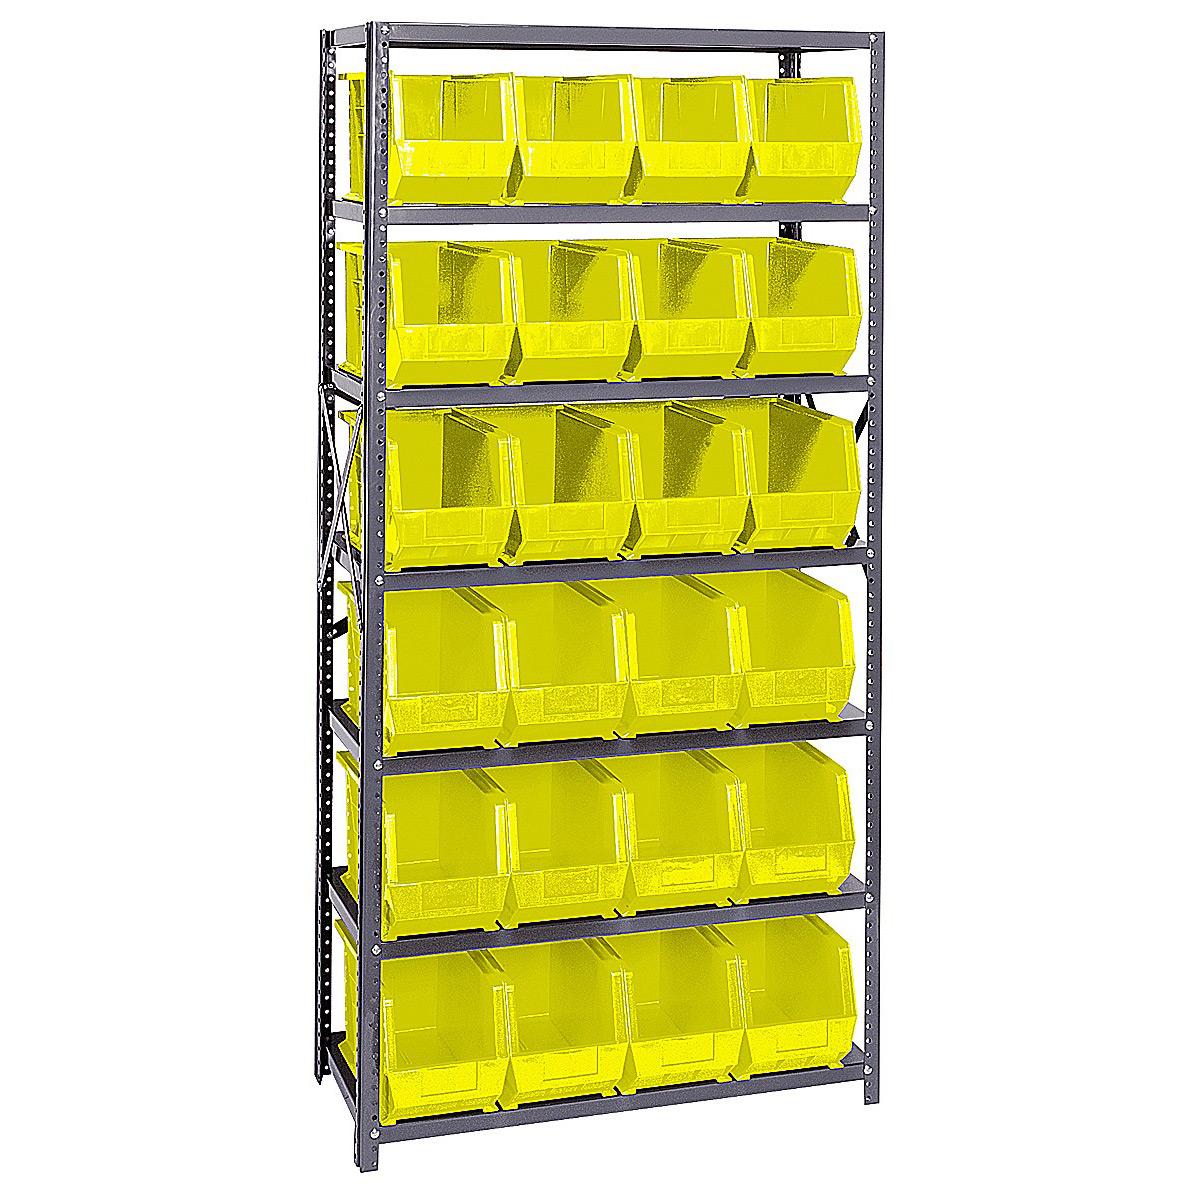 Open Hopper Storage Unit 24 Bins In Plastic Storage Bins